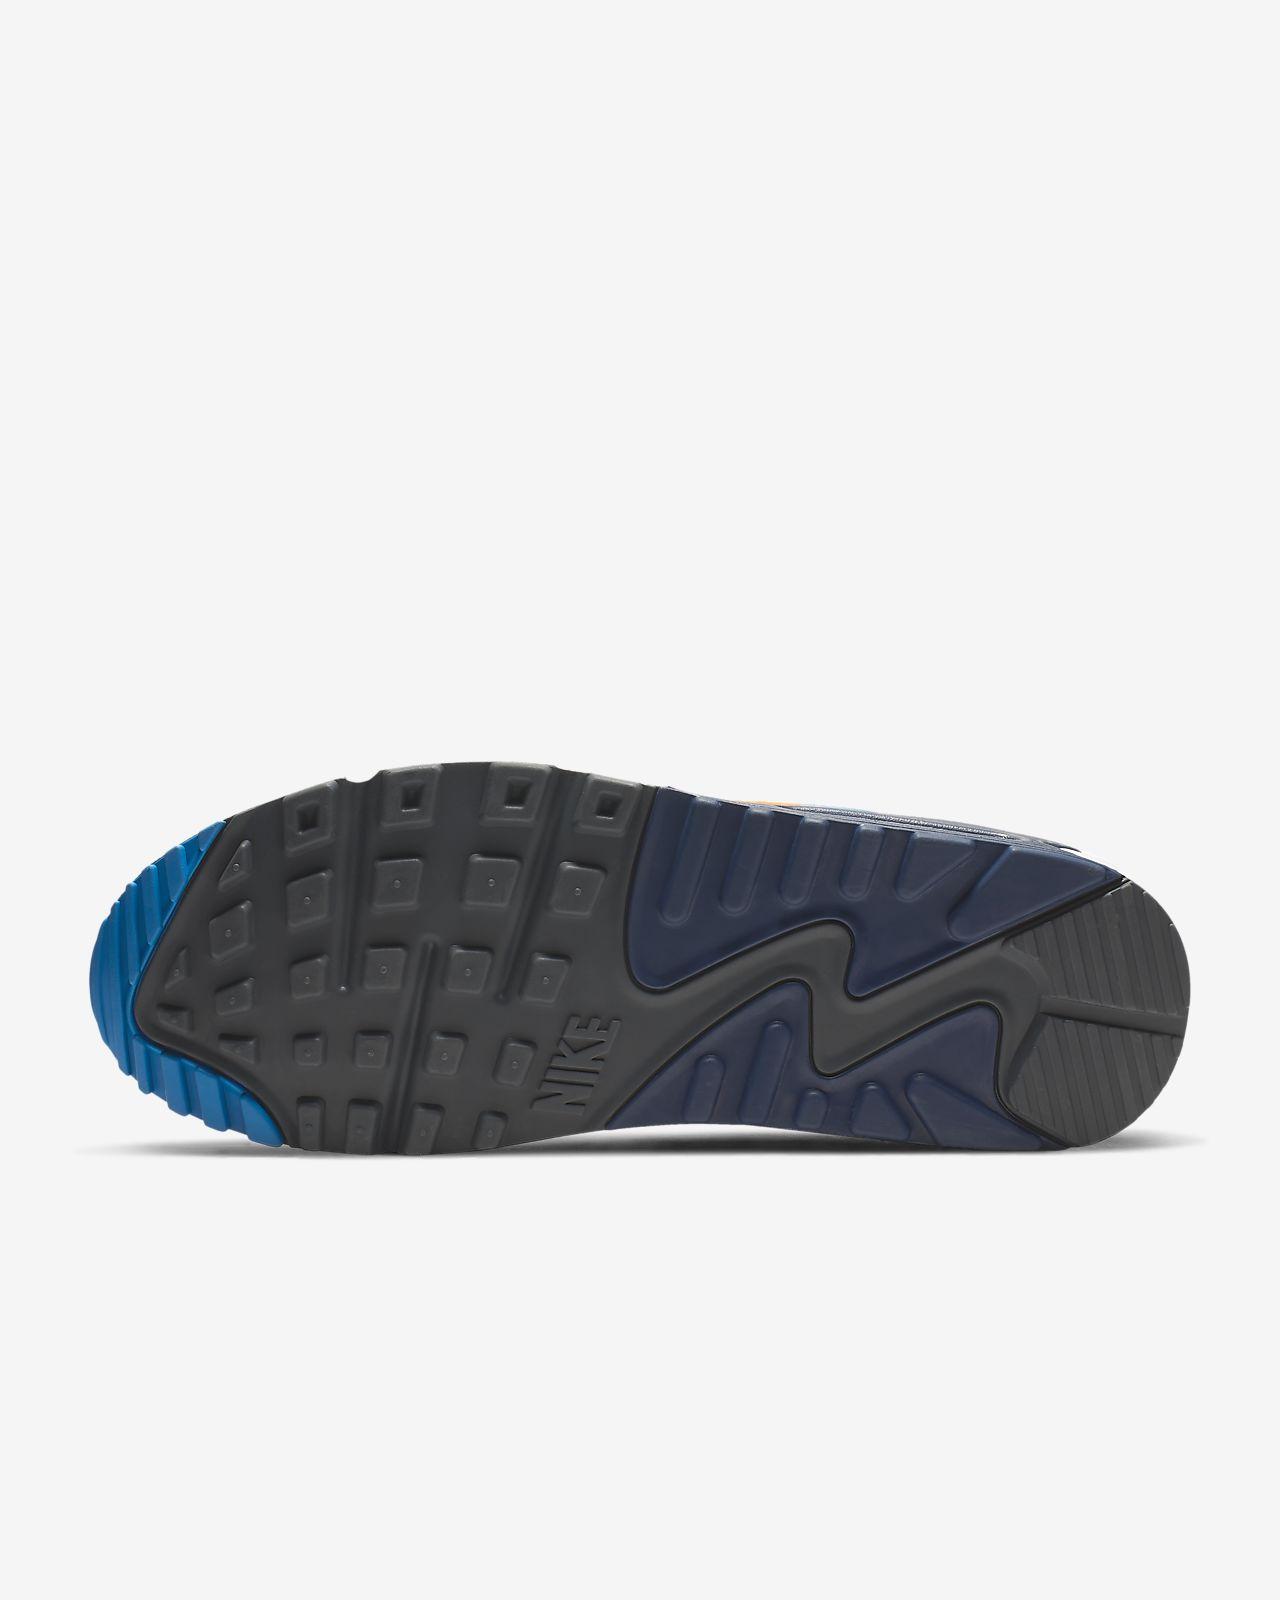 Nike Air Max 90 Essential Zapatillas Hombre